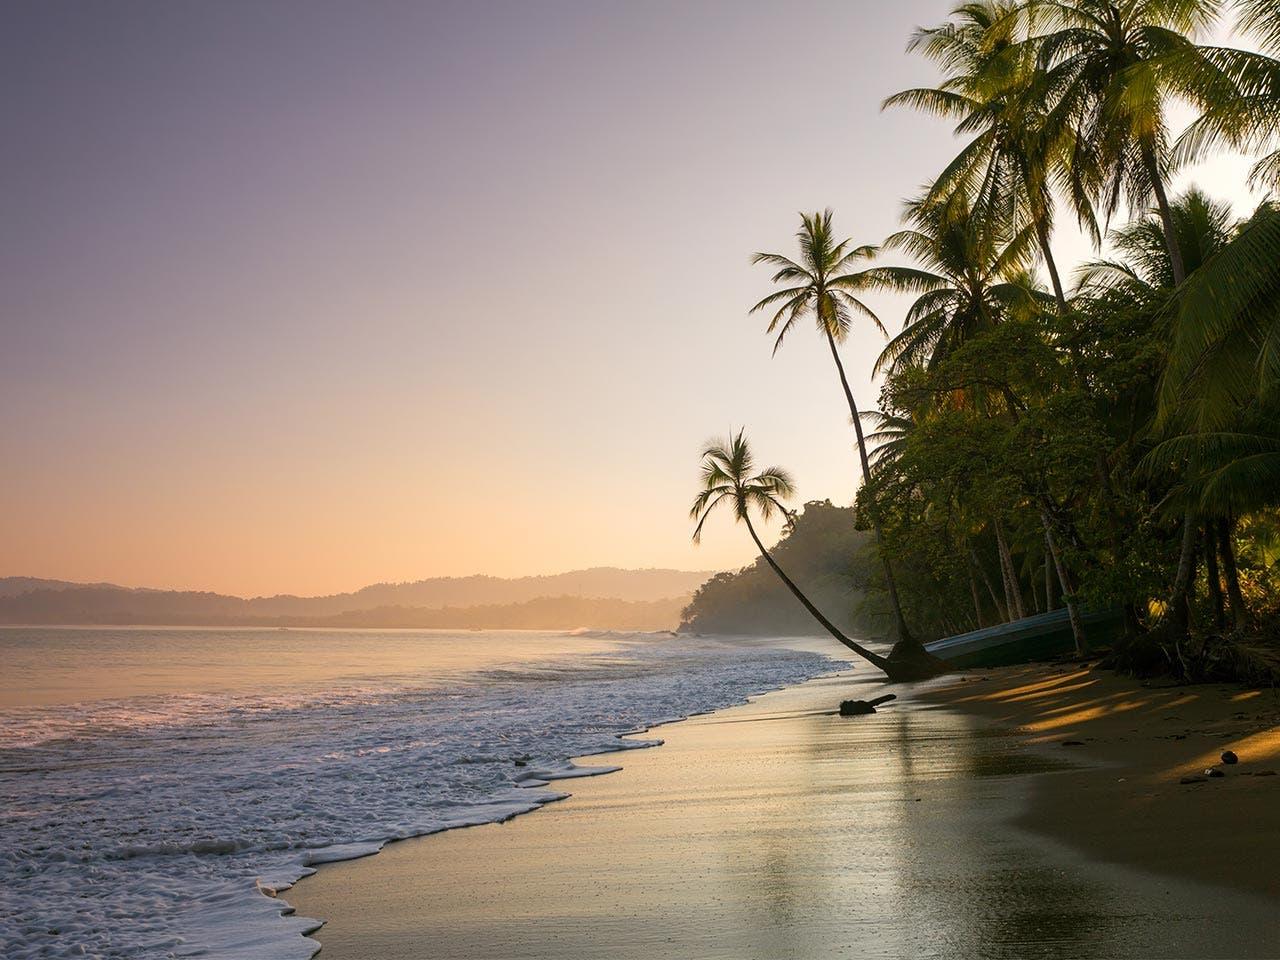 Costa Rica | Matteo Colombo/Shutterstock.com